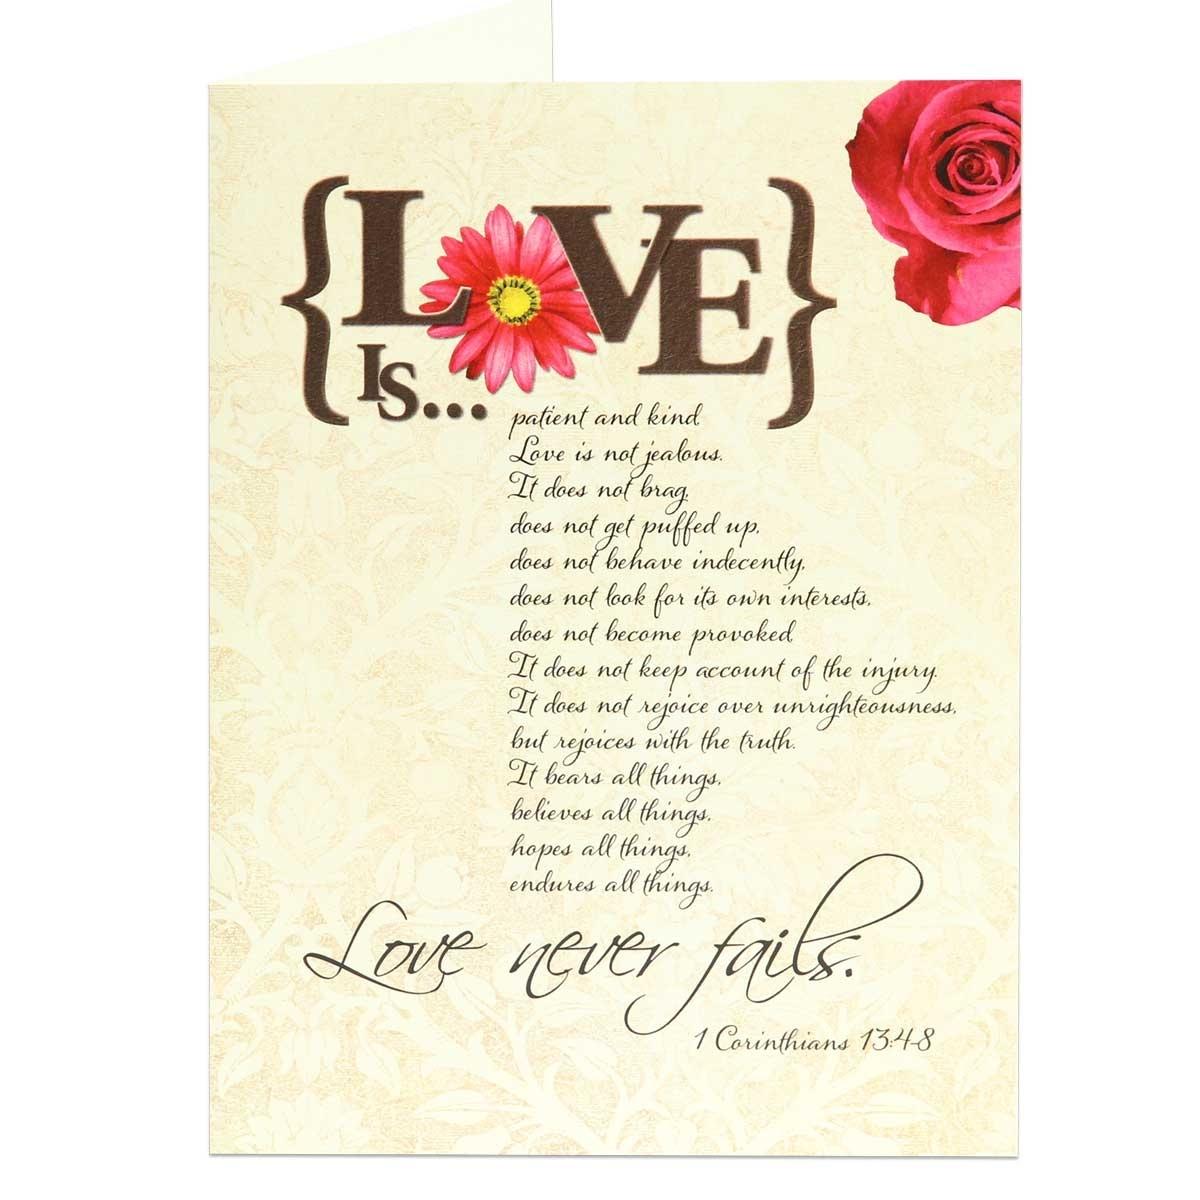 I love you pack assorted weddinganniversary greeting cards retail kristyandbryce Gallery